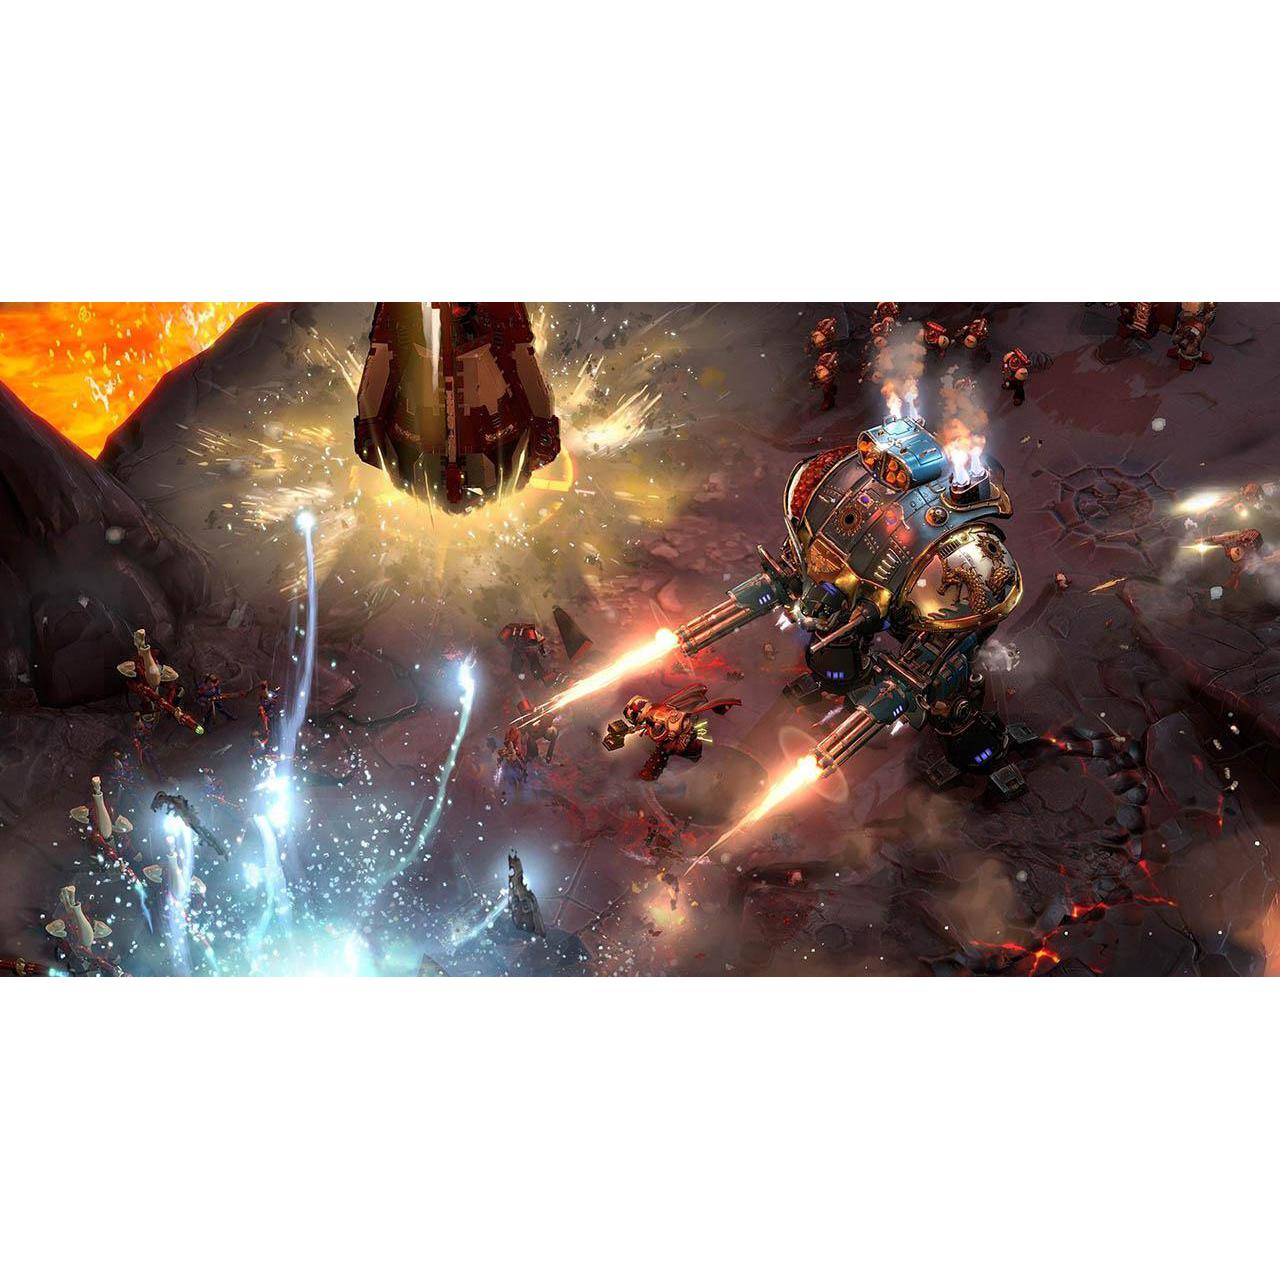 Joc Dawn of War 3 pentru PC 3